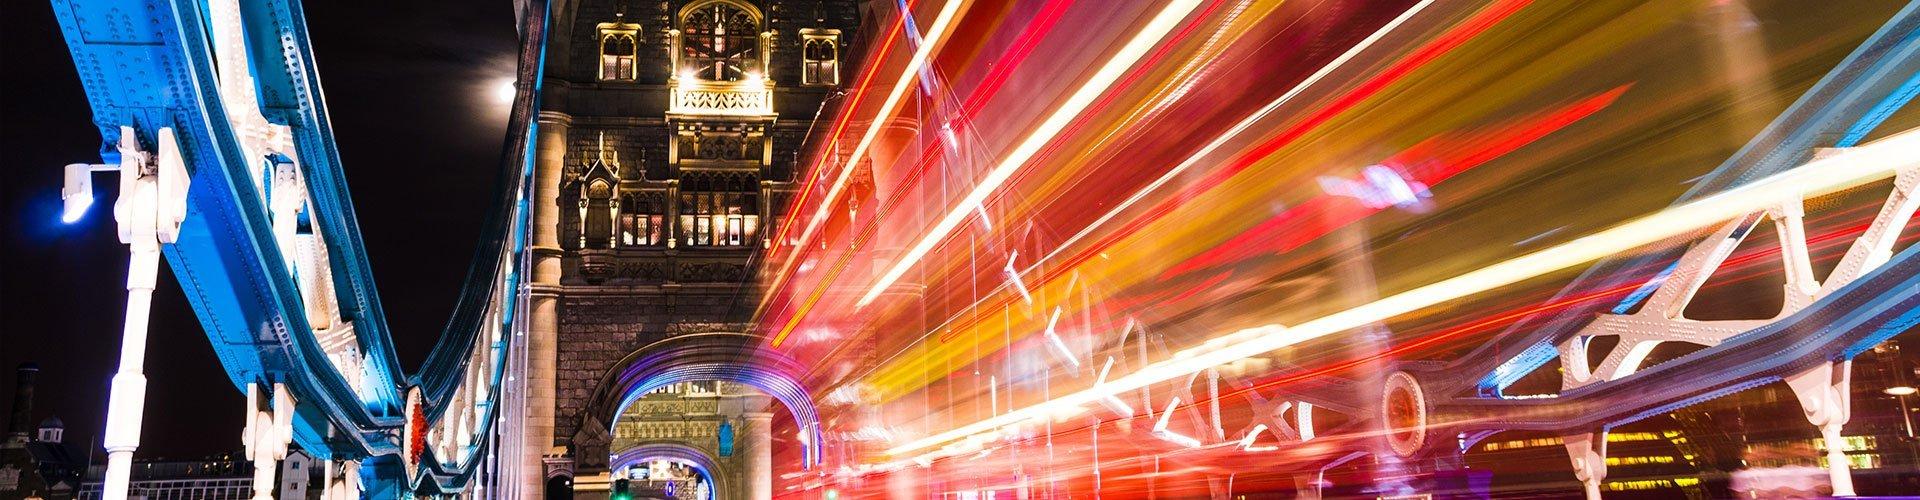 London bridge and lights